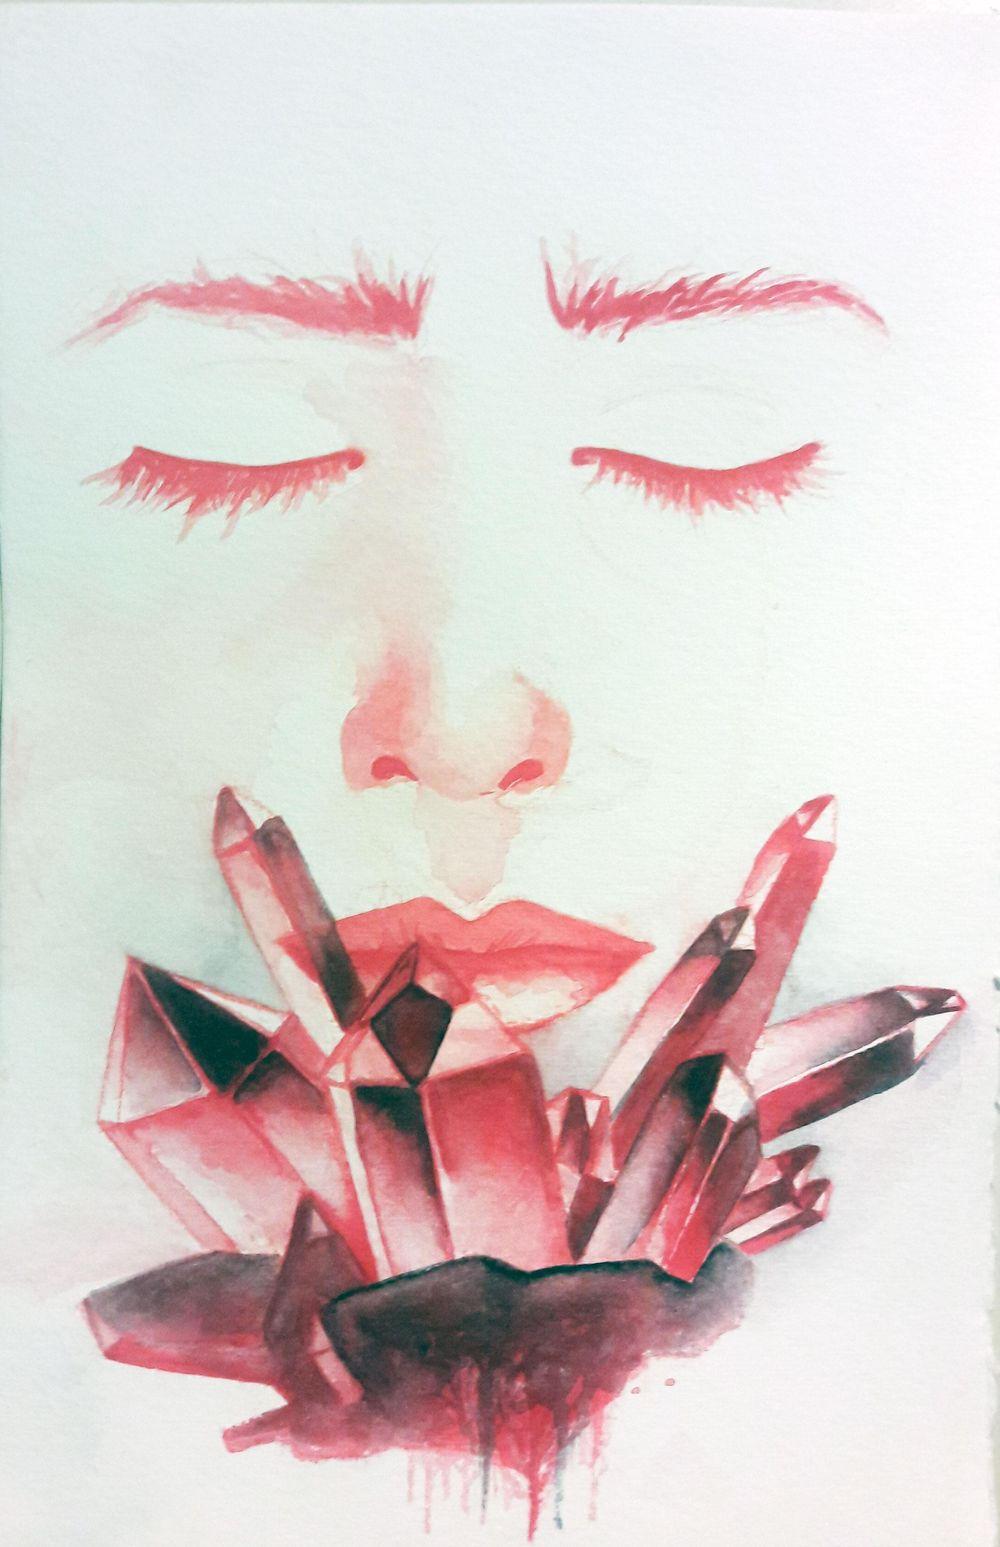 Ruby Tuesday ♪♫ | Ariana Iacono - image 1 - student project